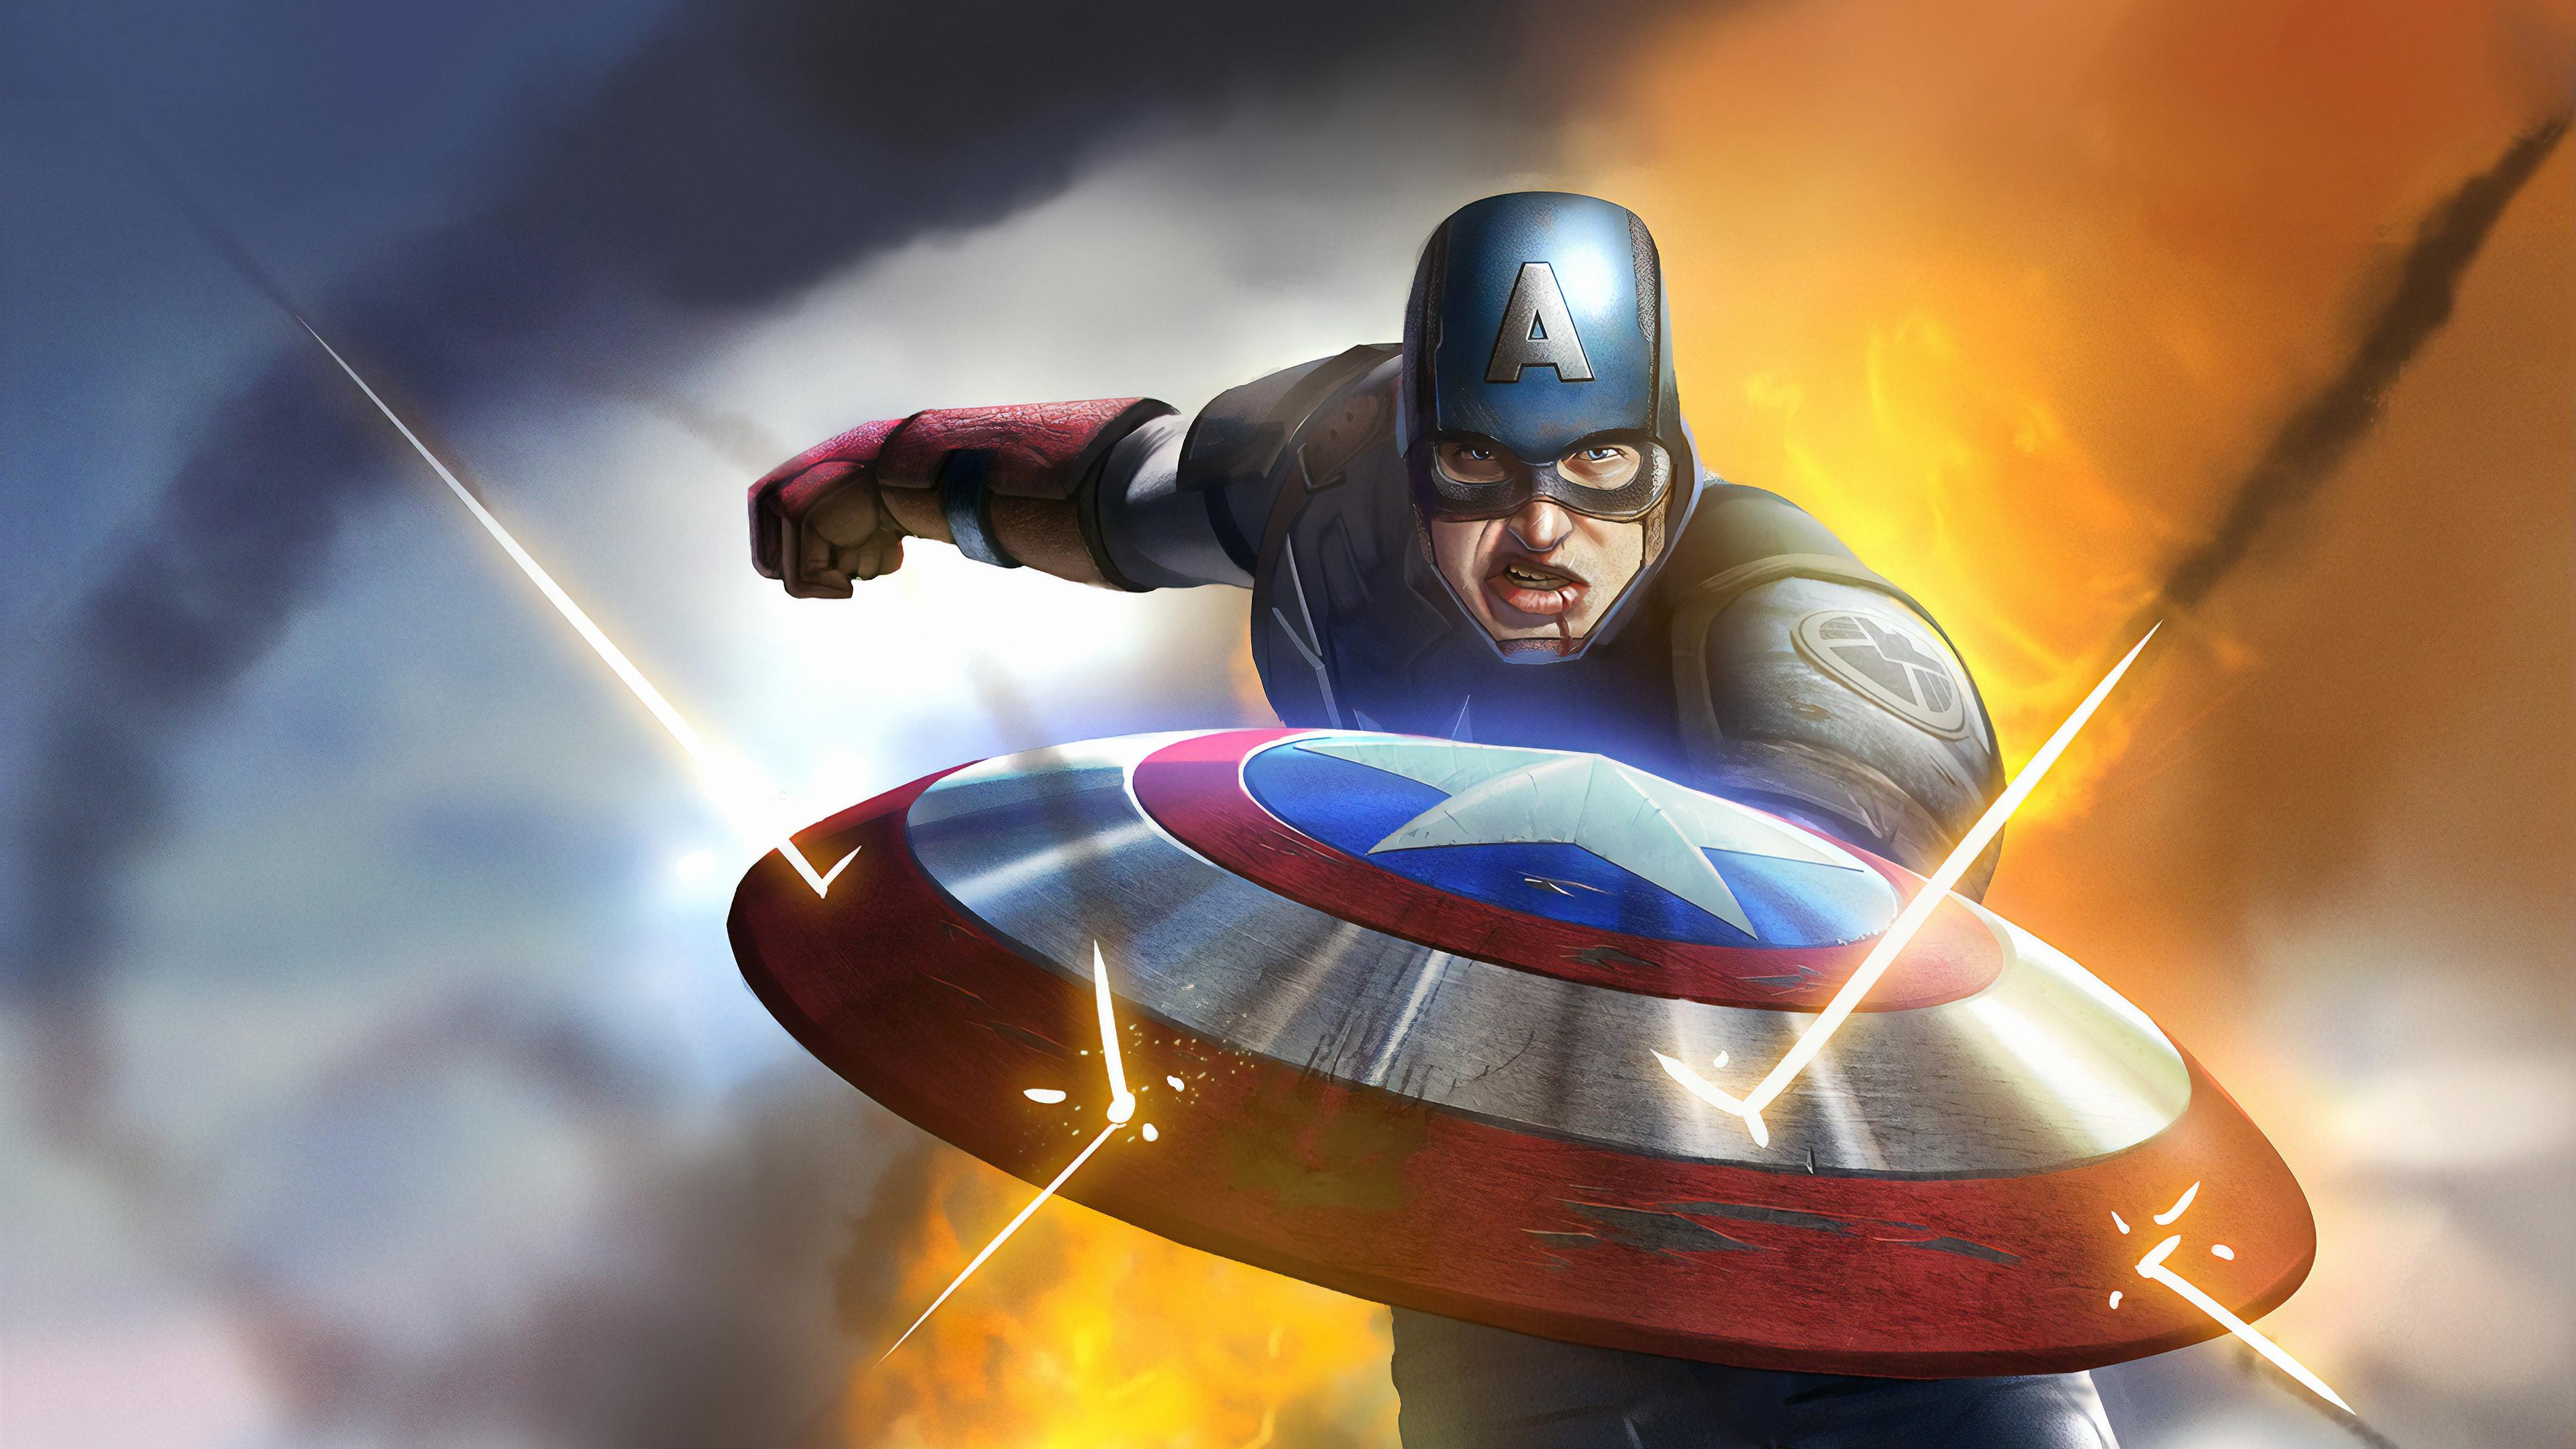 captain america coming 1570394655 - Captain America Coming - superheroes wallpapers, hd-wallpapers, deviantart wallpapers, captain america wallpapers, artwork wallpapers, 4k-wallpapers